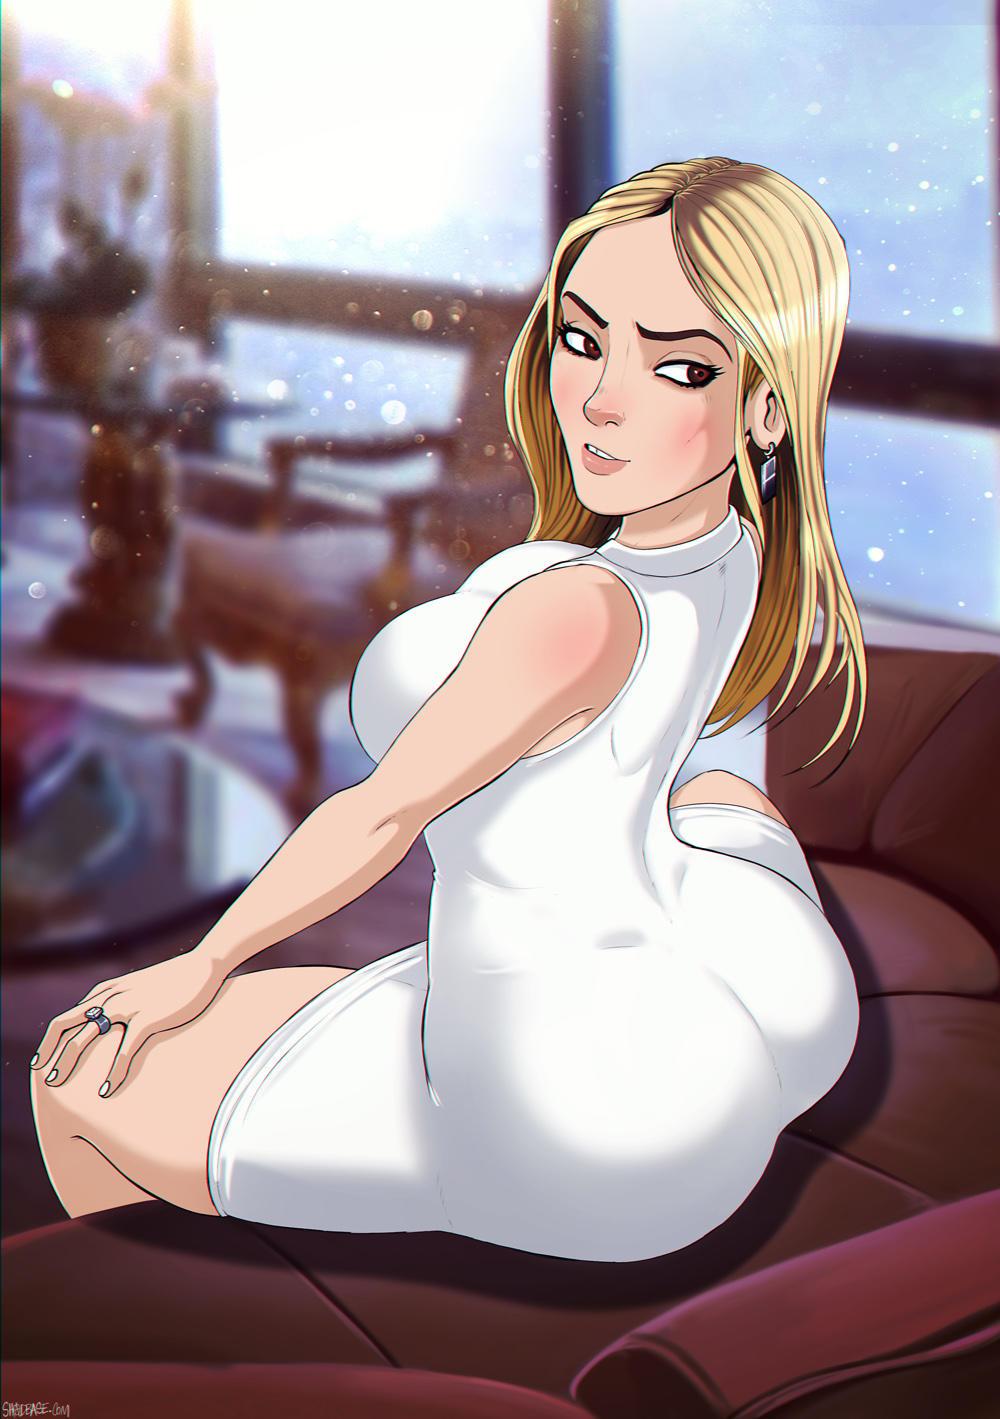 Shadman illustrates Ivanka Trump | Donald Trump | Know